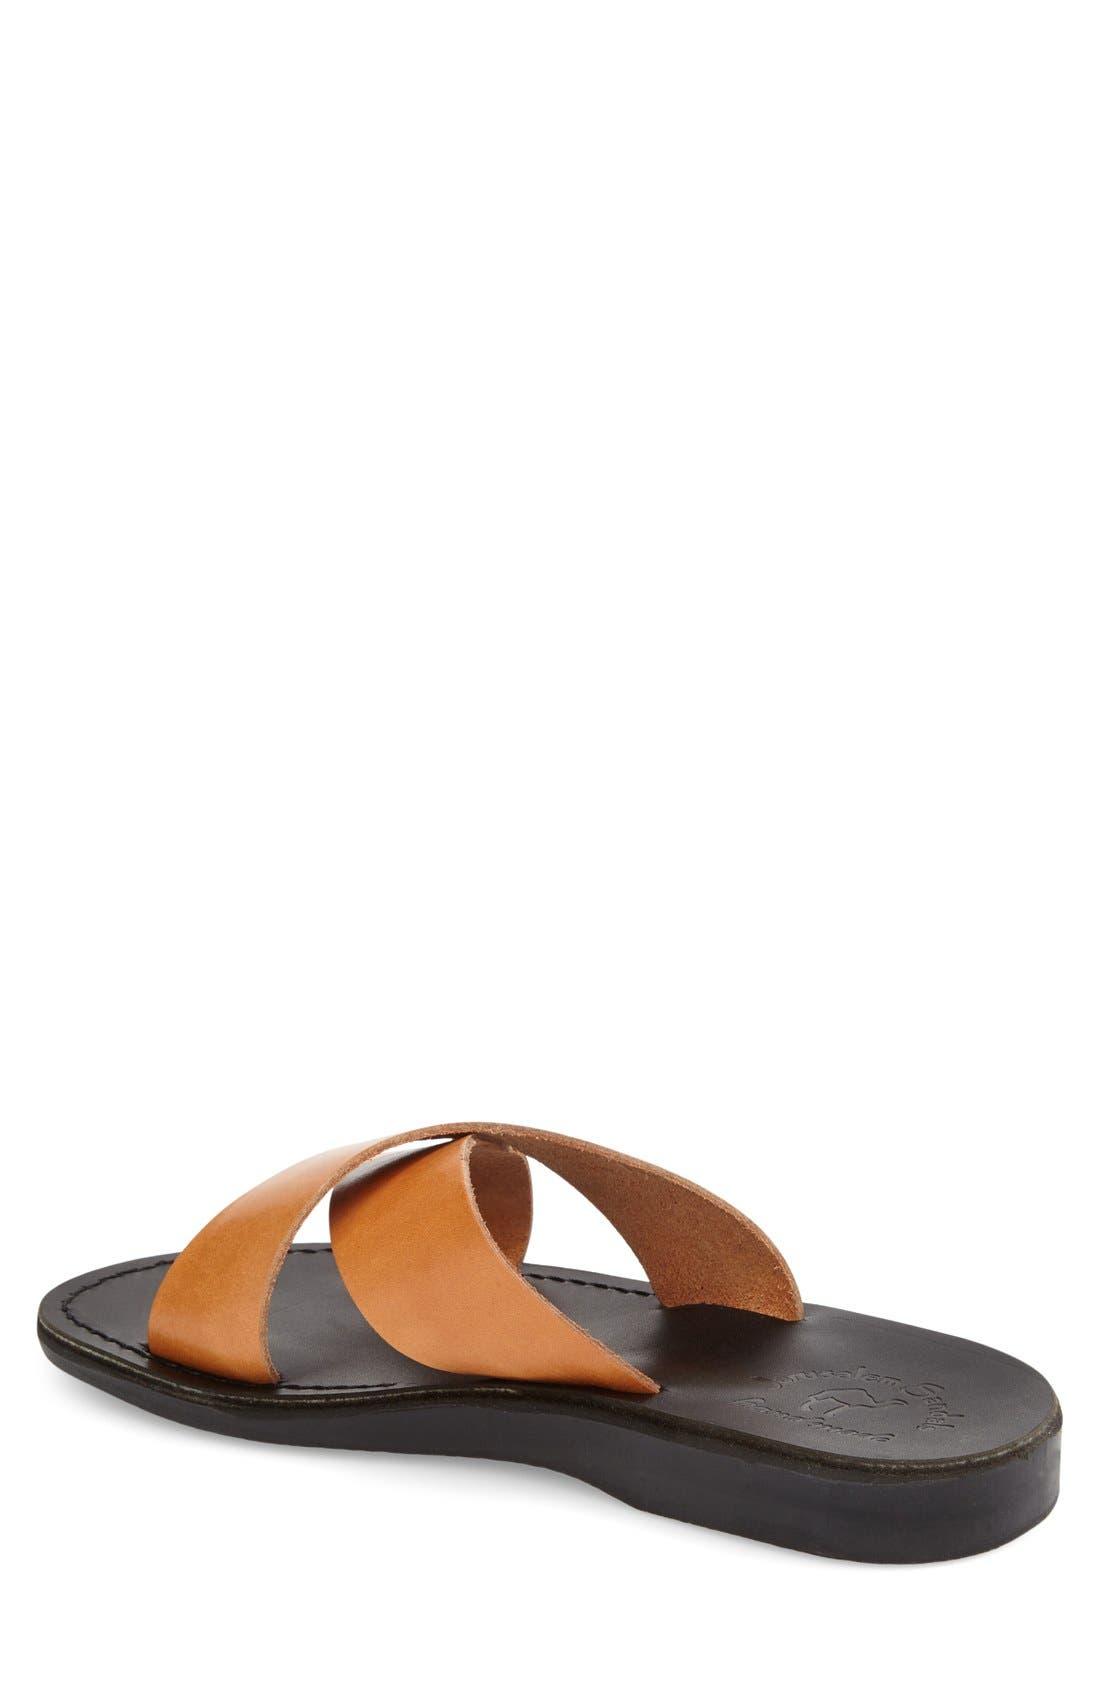 'Elan' Slide Sandal,                             Alternate thumbnail 6, color,                             TAN LEATHER/ BLACK